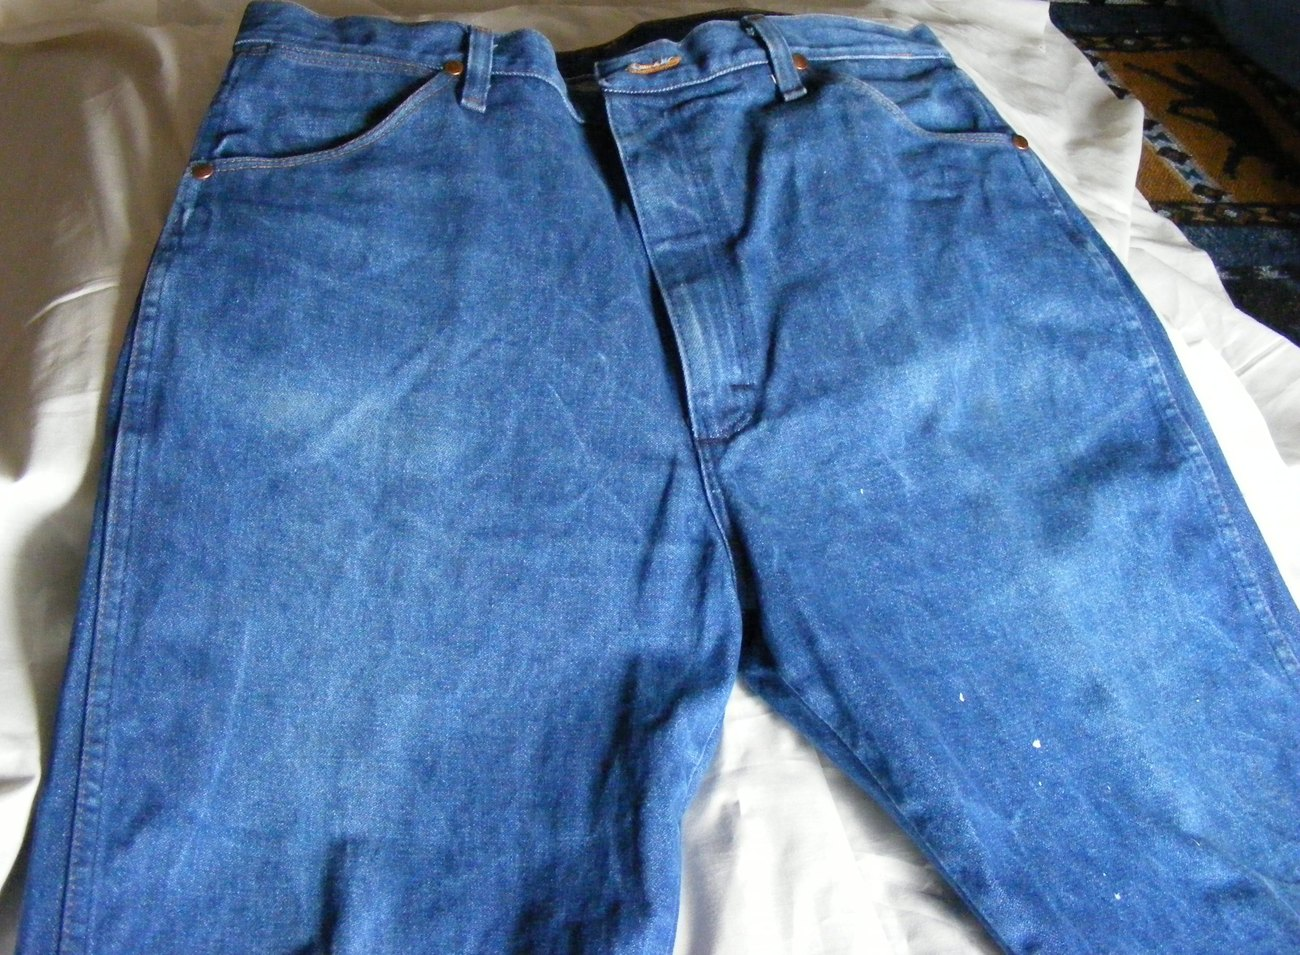 Wrangler Men's Jeans Cowboy Cut 13MWZ 36x36 Rigid Indigo